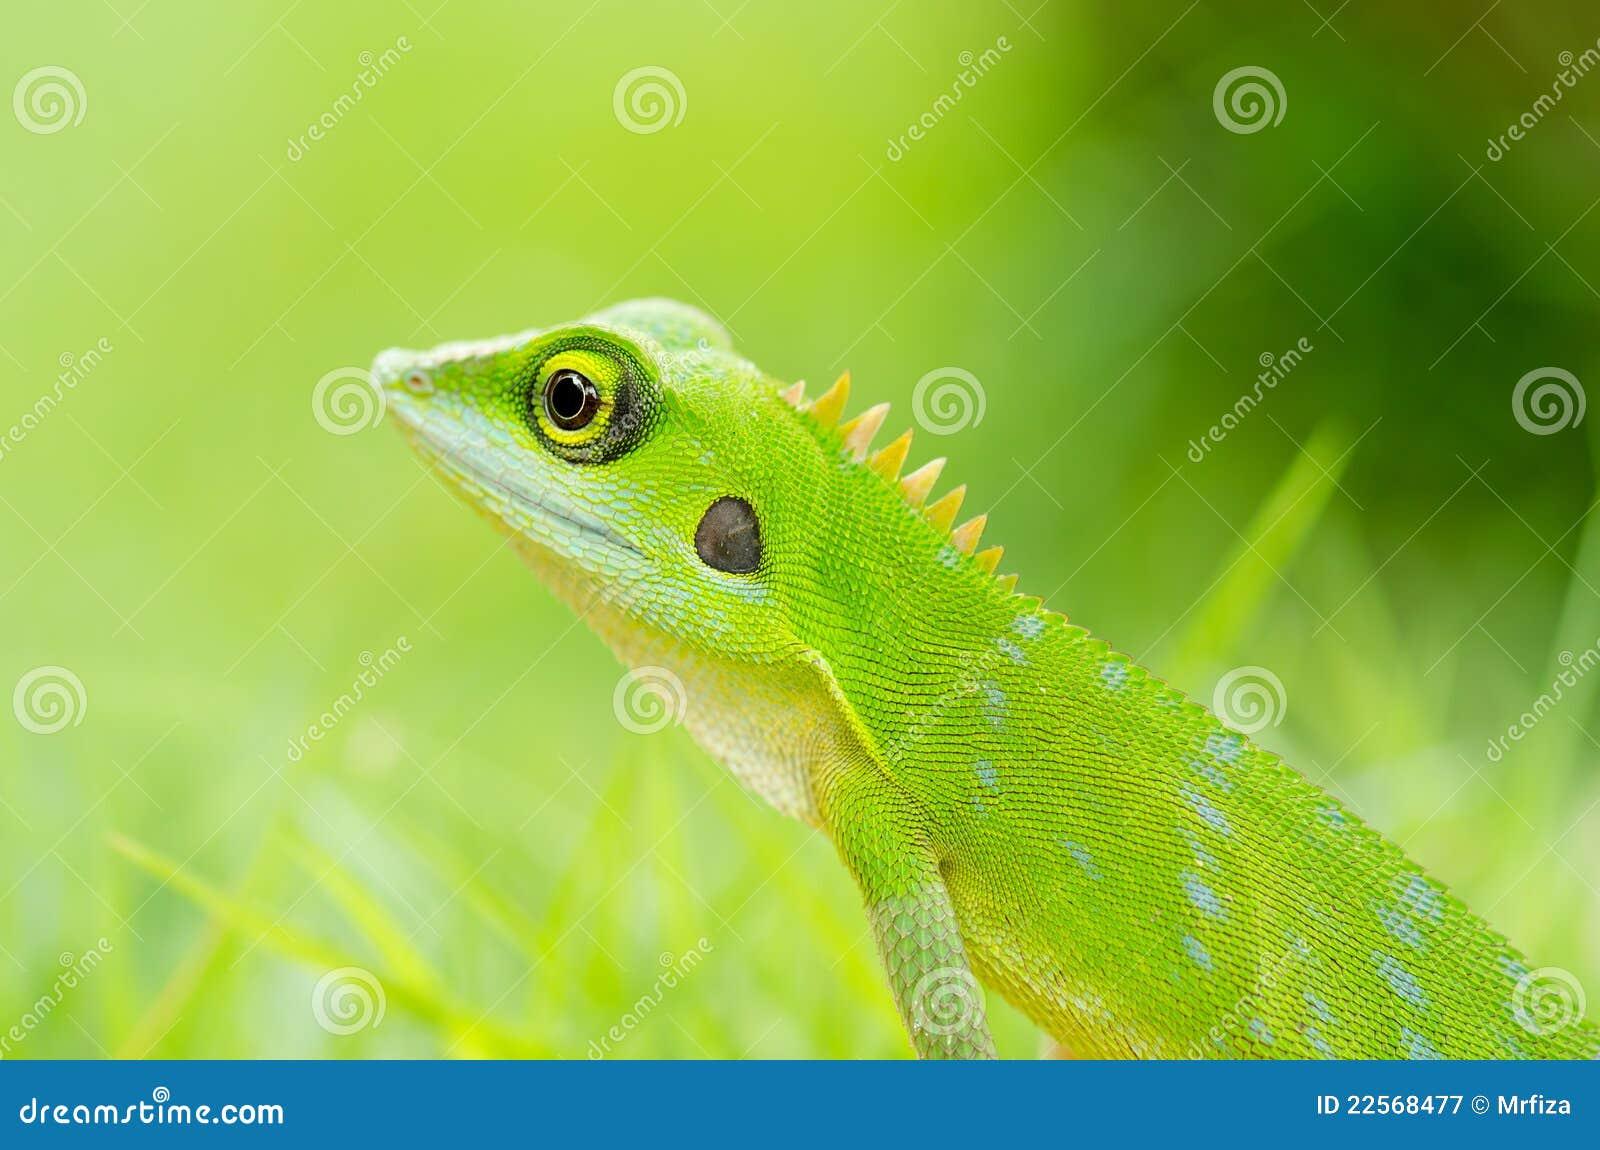 Crimson Lizard Web Design